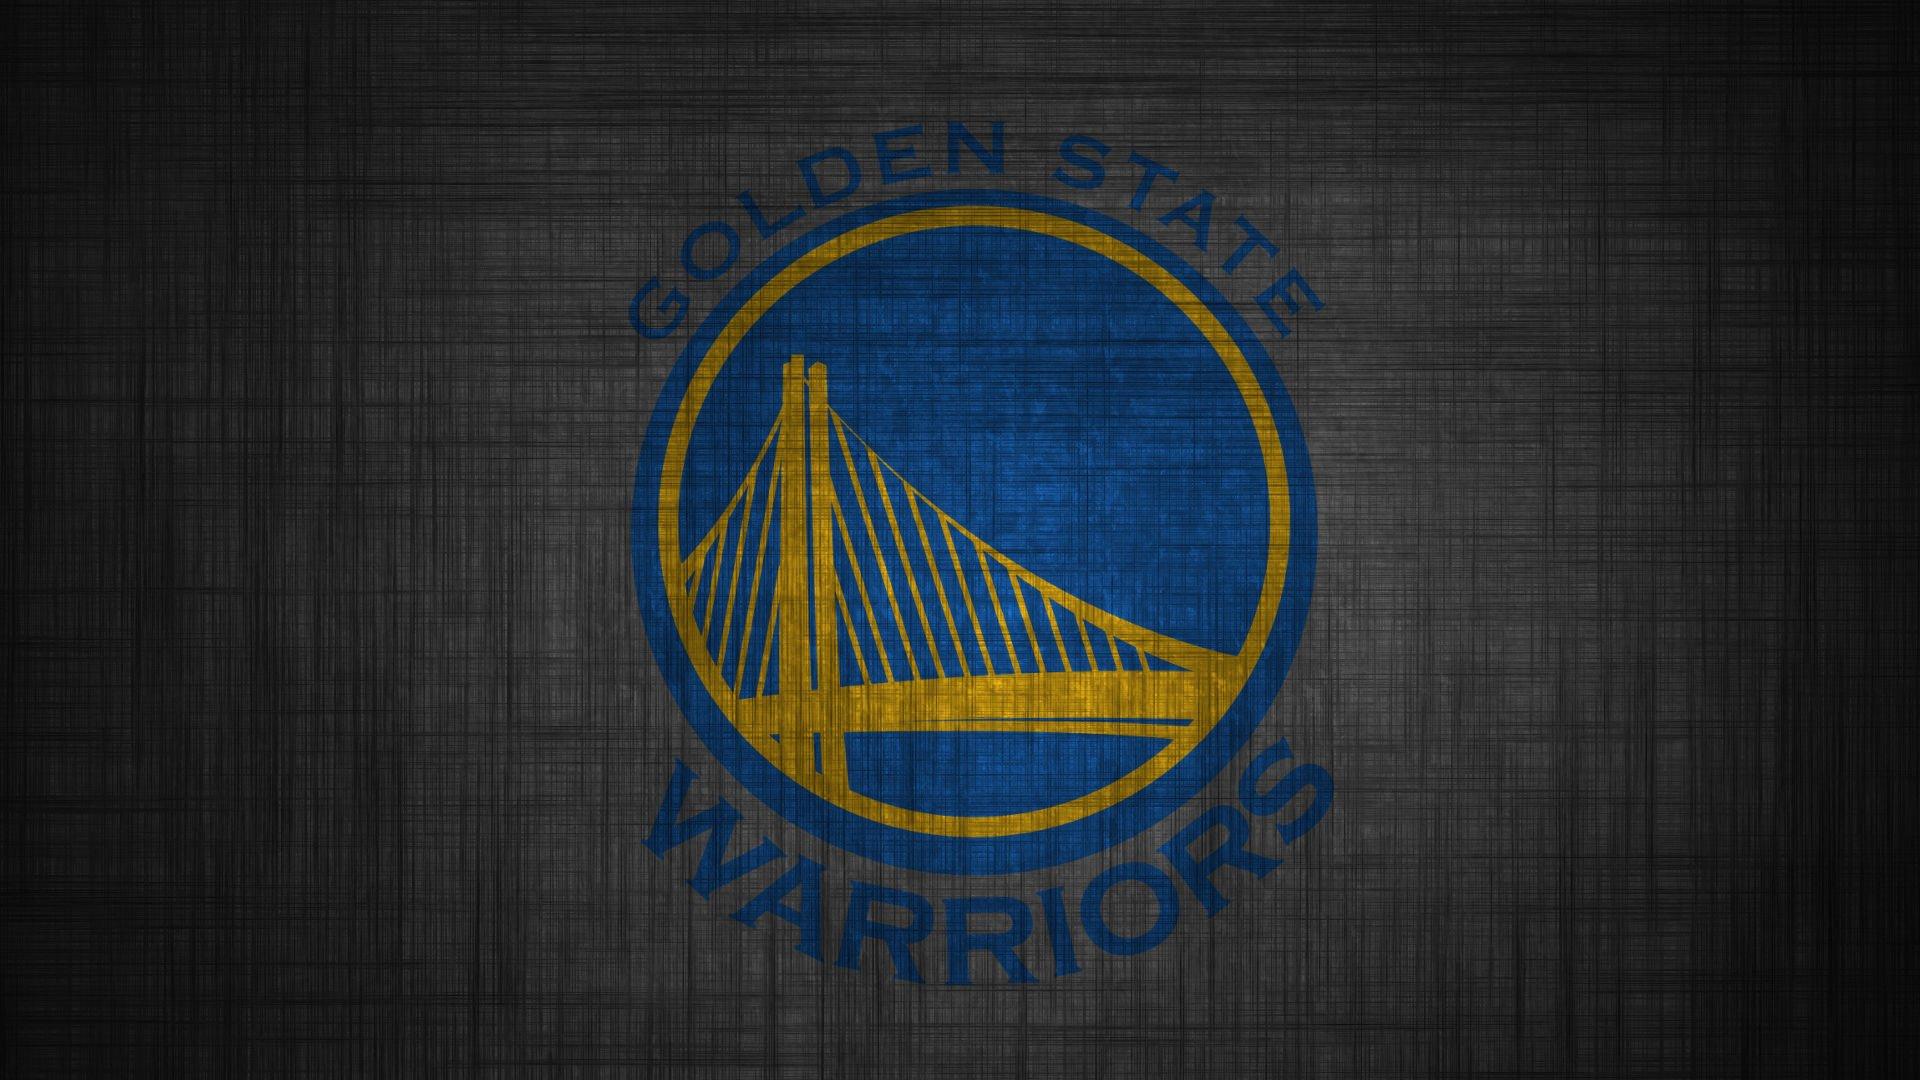 Golden State Warriors Wallpaper Ipad